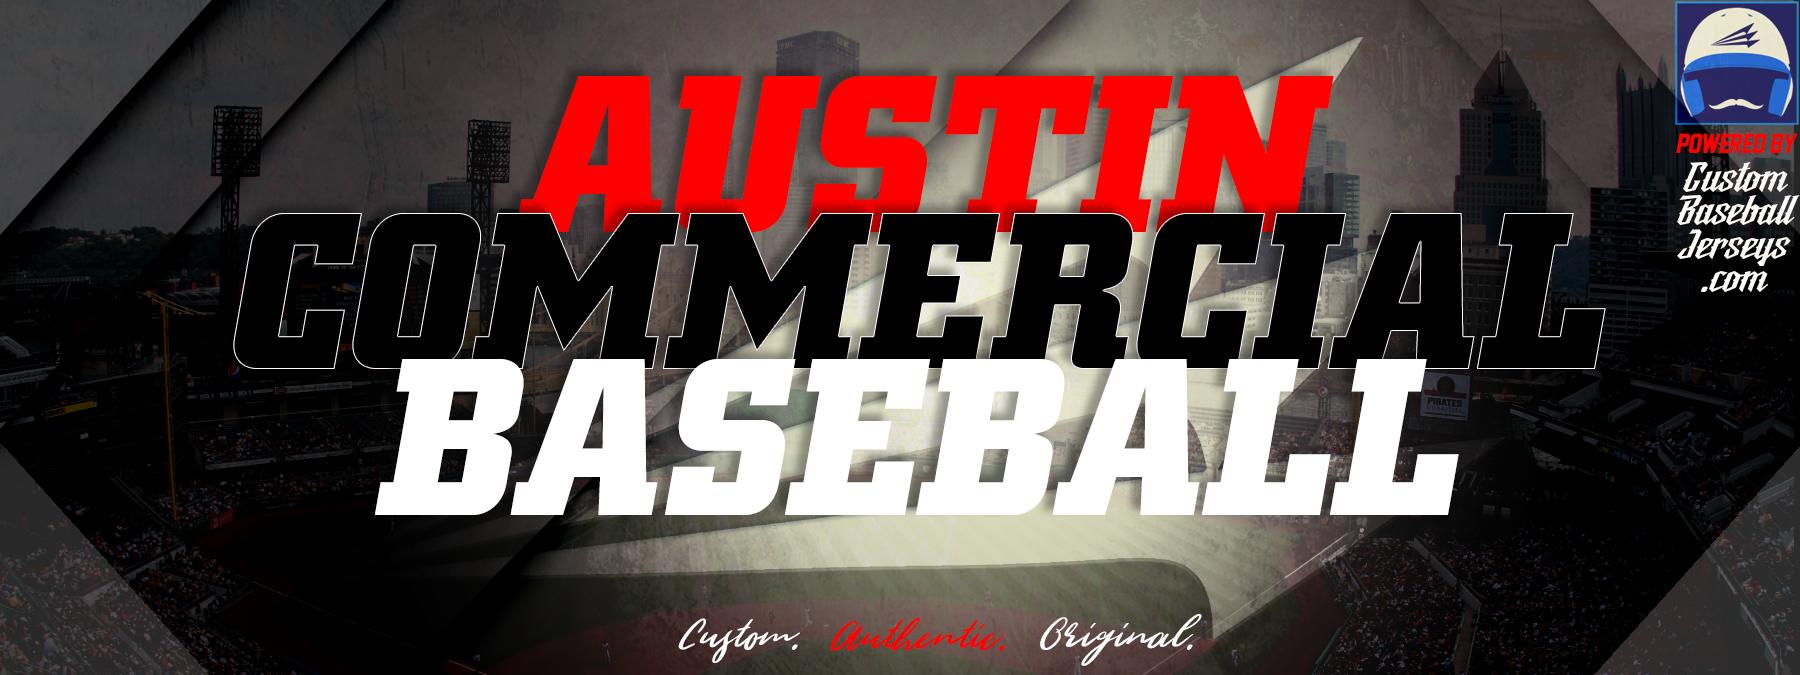 4eab907b0 Austin Commercial Custom Throwback Baseball Jerseys - Custom Baseball  Jerseys.com - The World s  1 Choice for Custom Baseball Uniforms